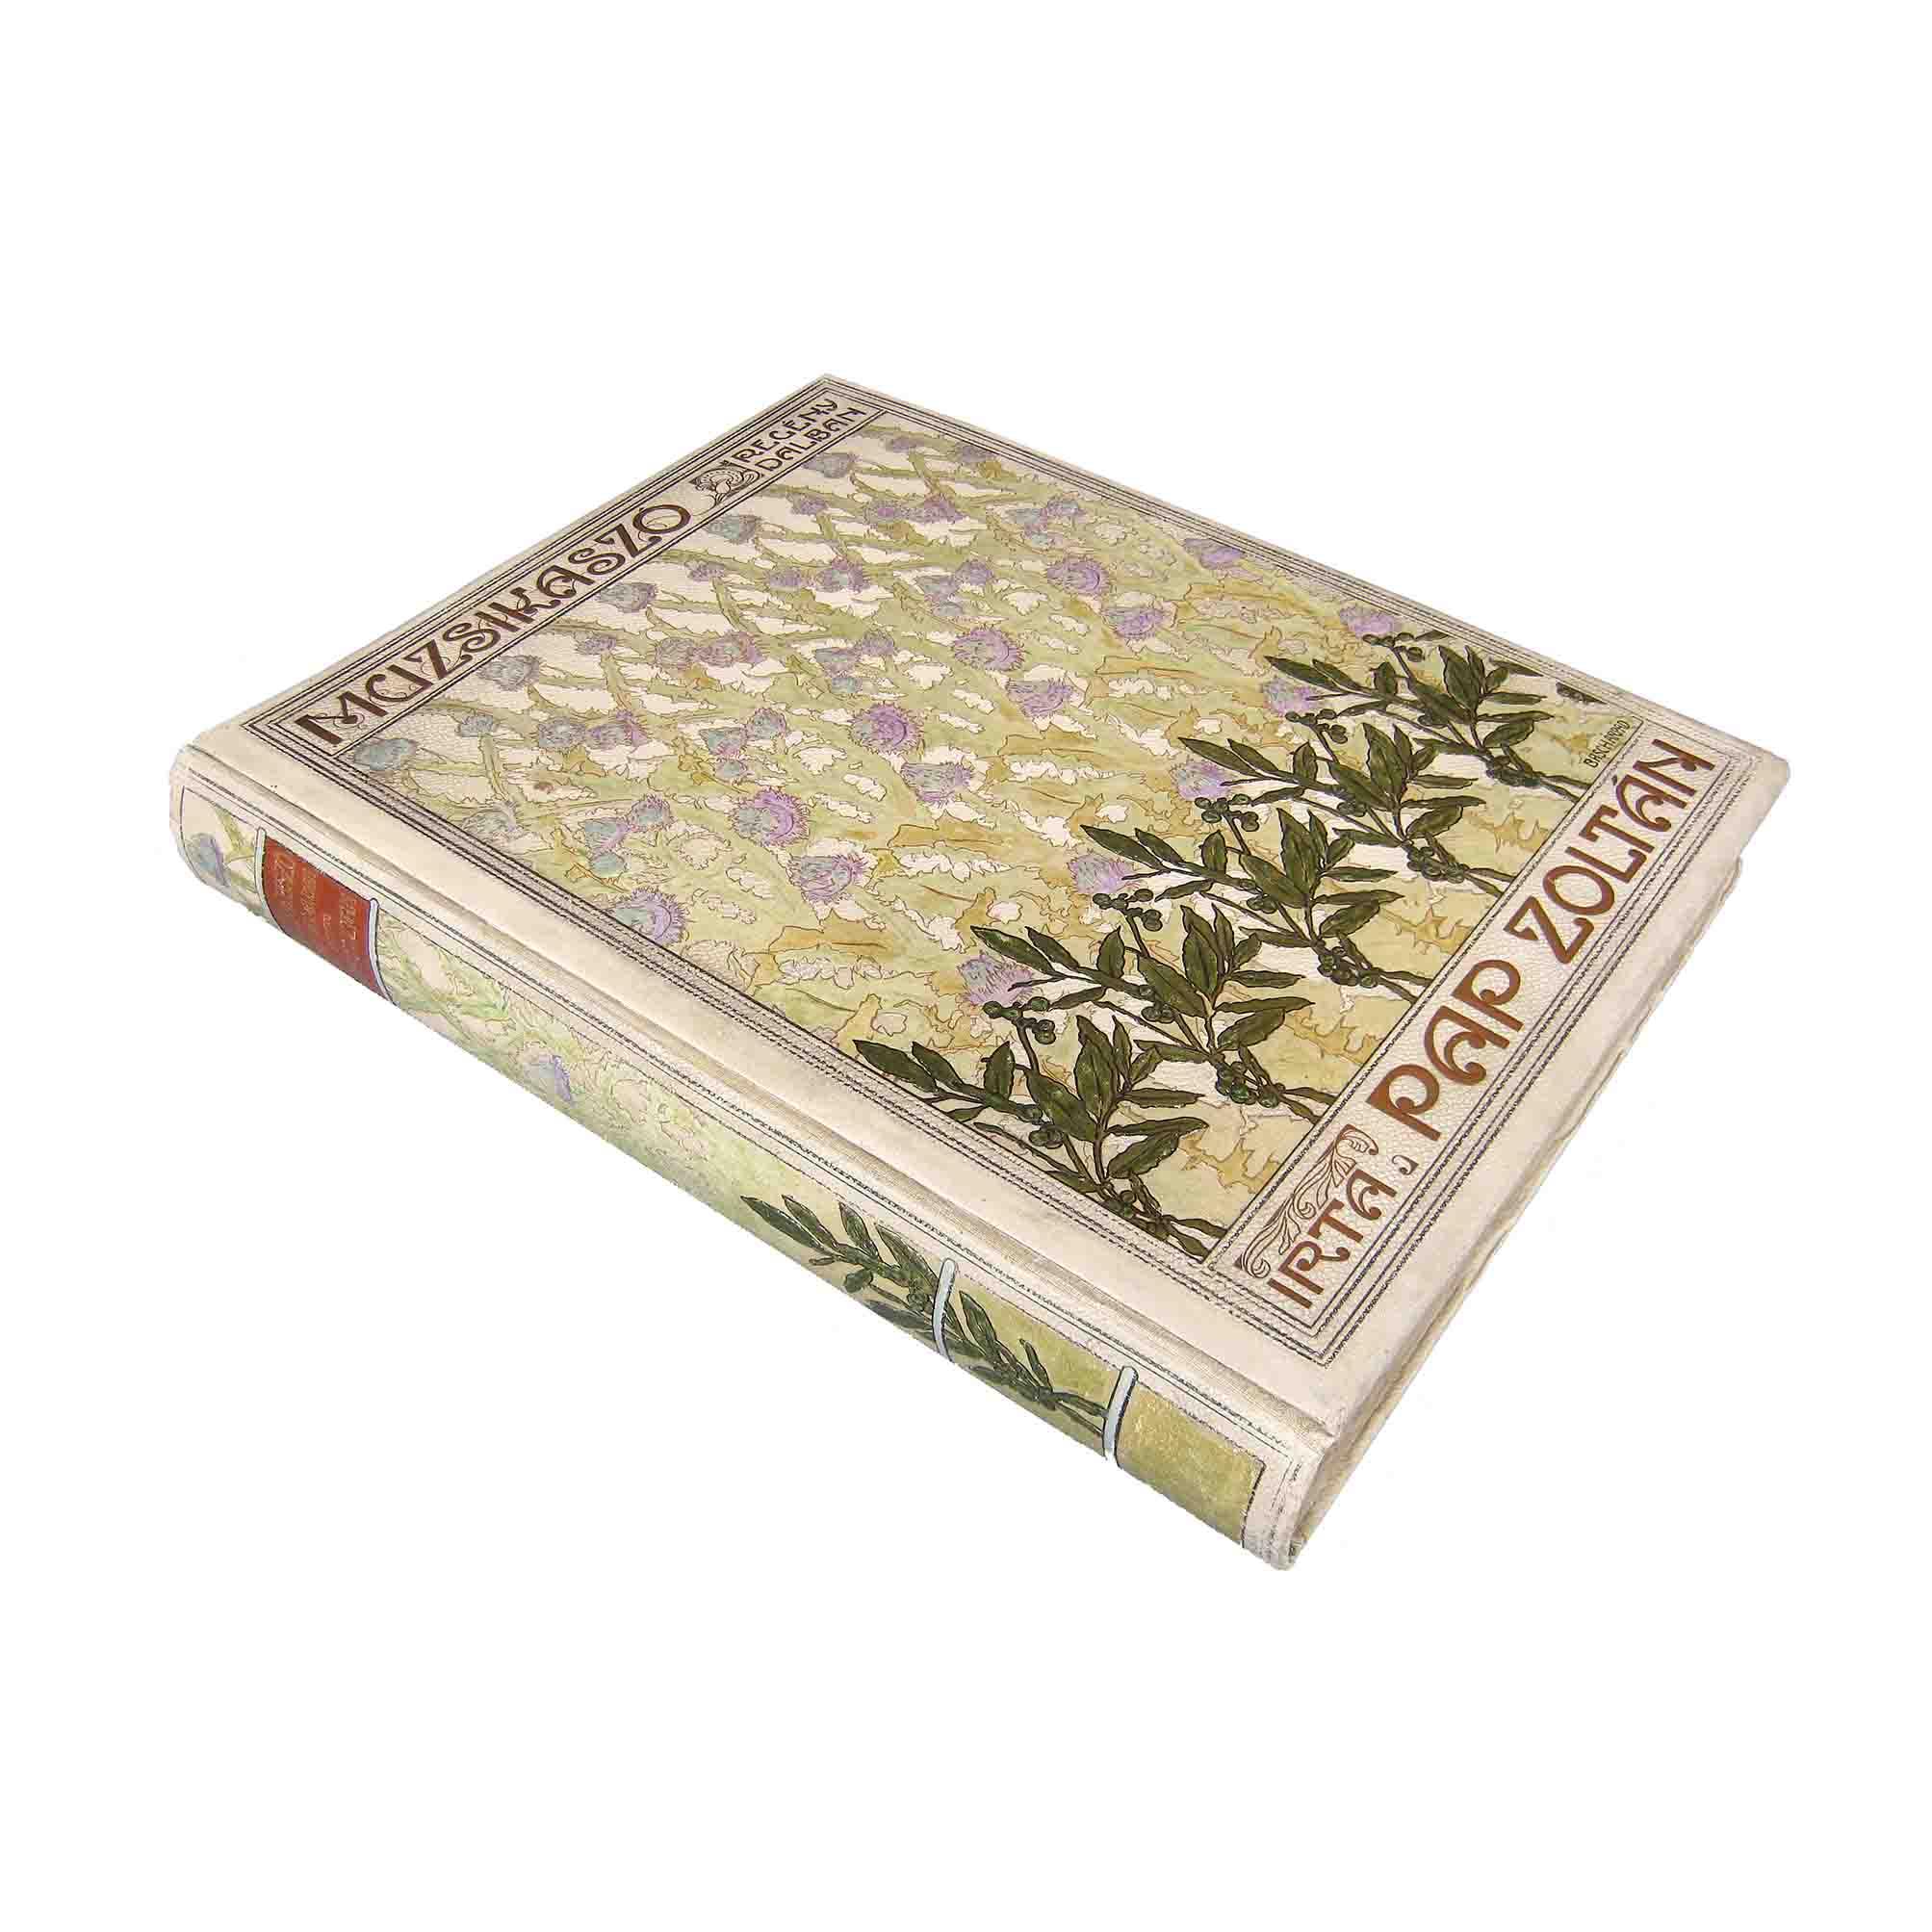 6053 Pal Basch Muzsikaszo 1911 Cover recto free N Kopie